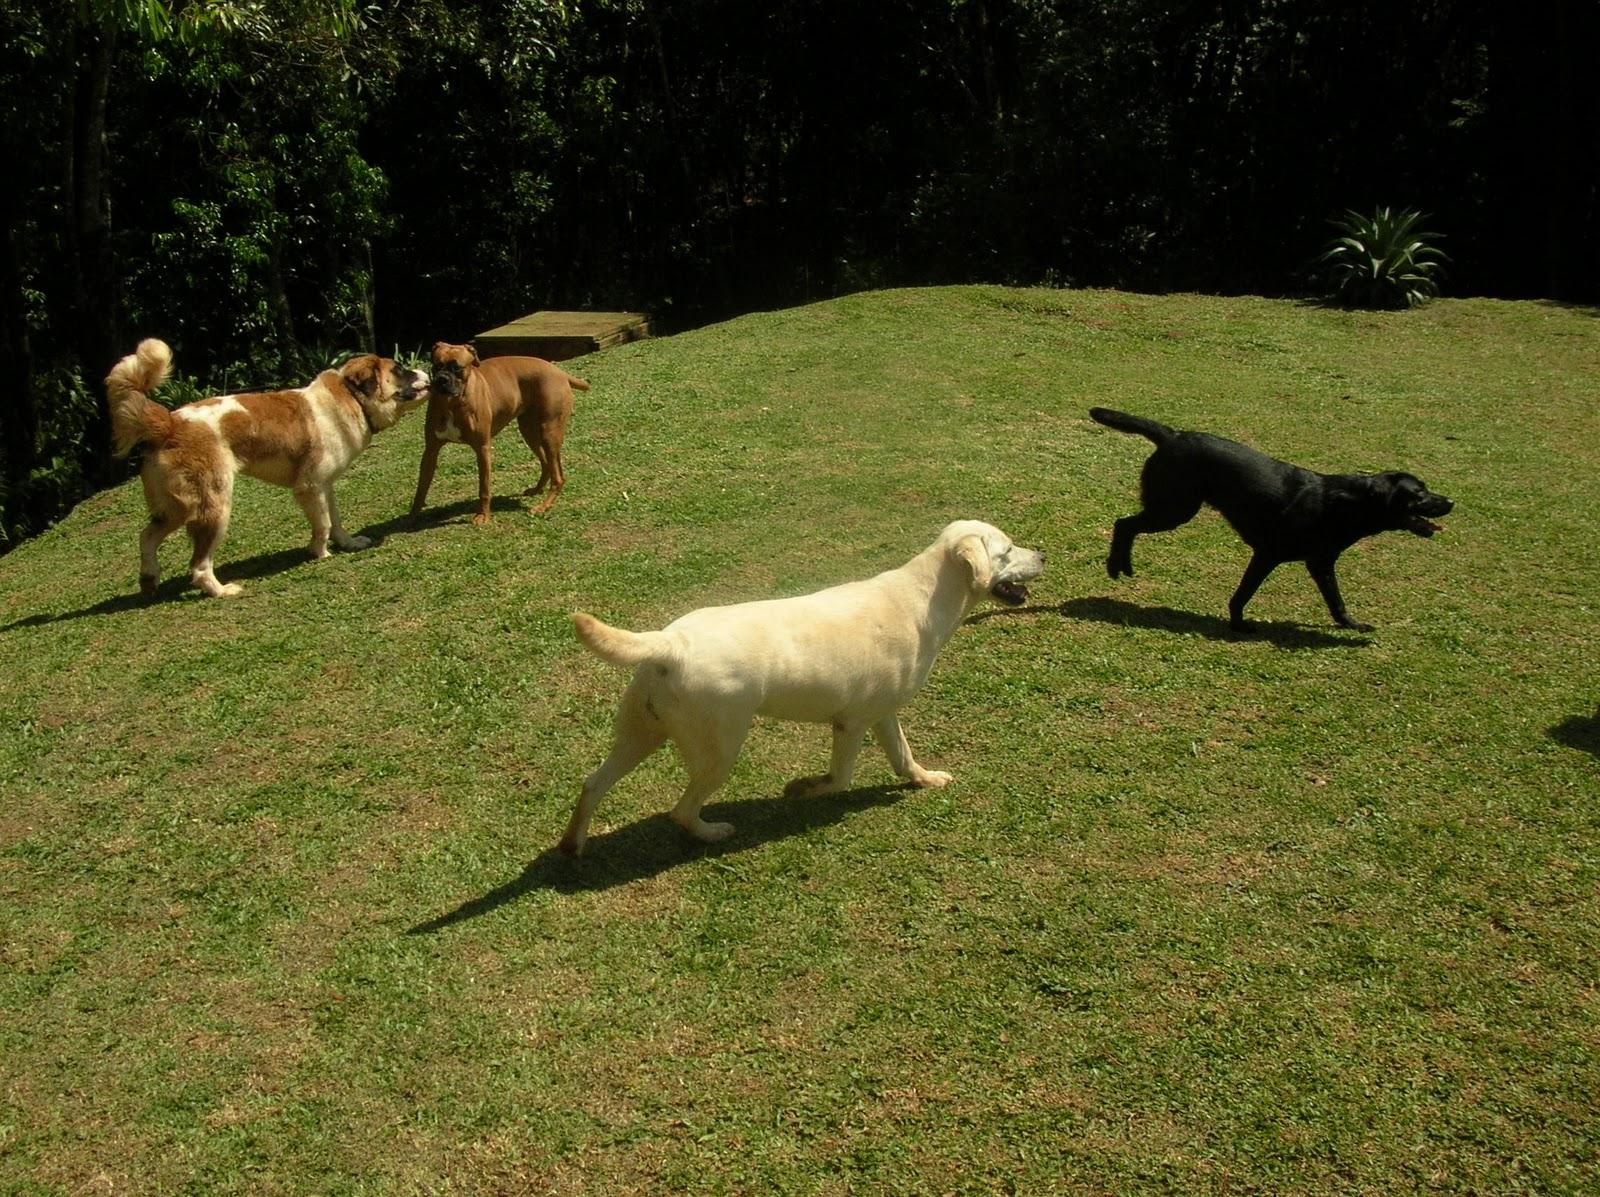 http://2.bp.blogspot.com/_sEjMhBx8jKk/TM9q2CGwiII/AAAAAAAAAzA/__oPBCM29R8/s1600/July,+Gaya,+Bella+(labrador+branco)+e+Bella+(labrador+preto).JPG